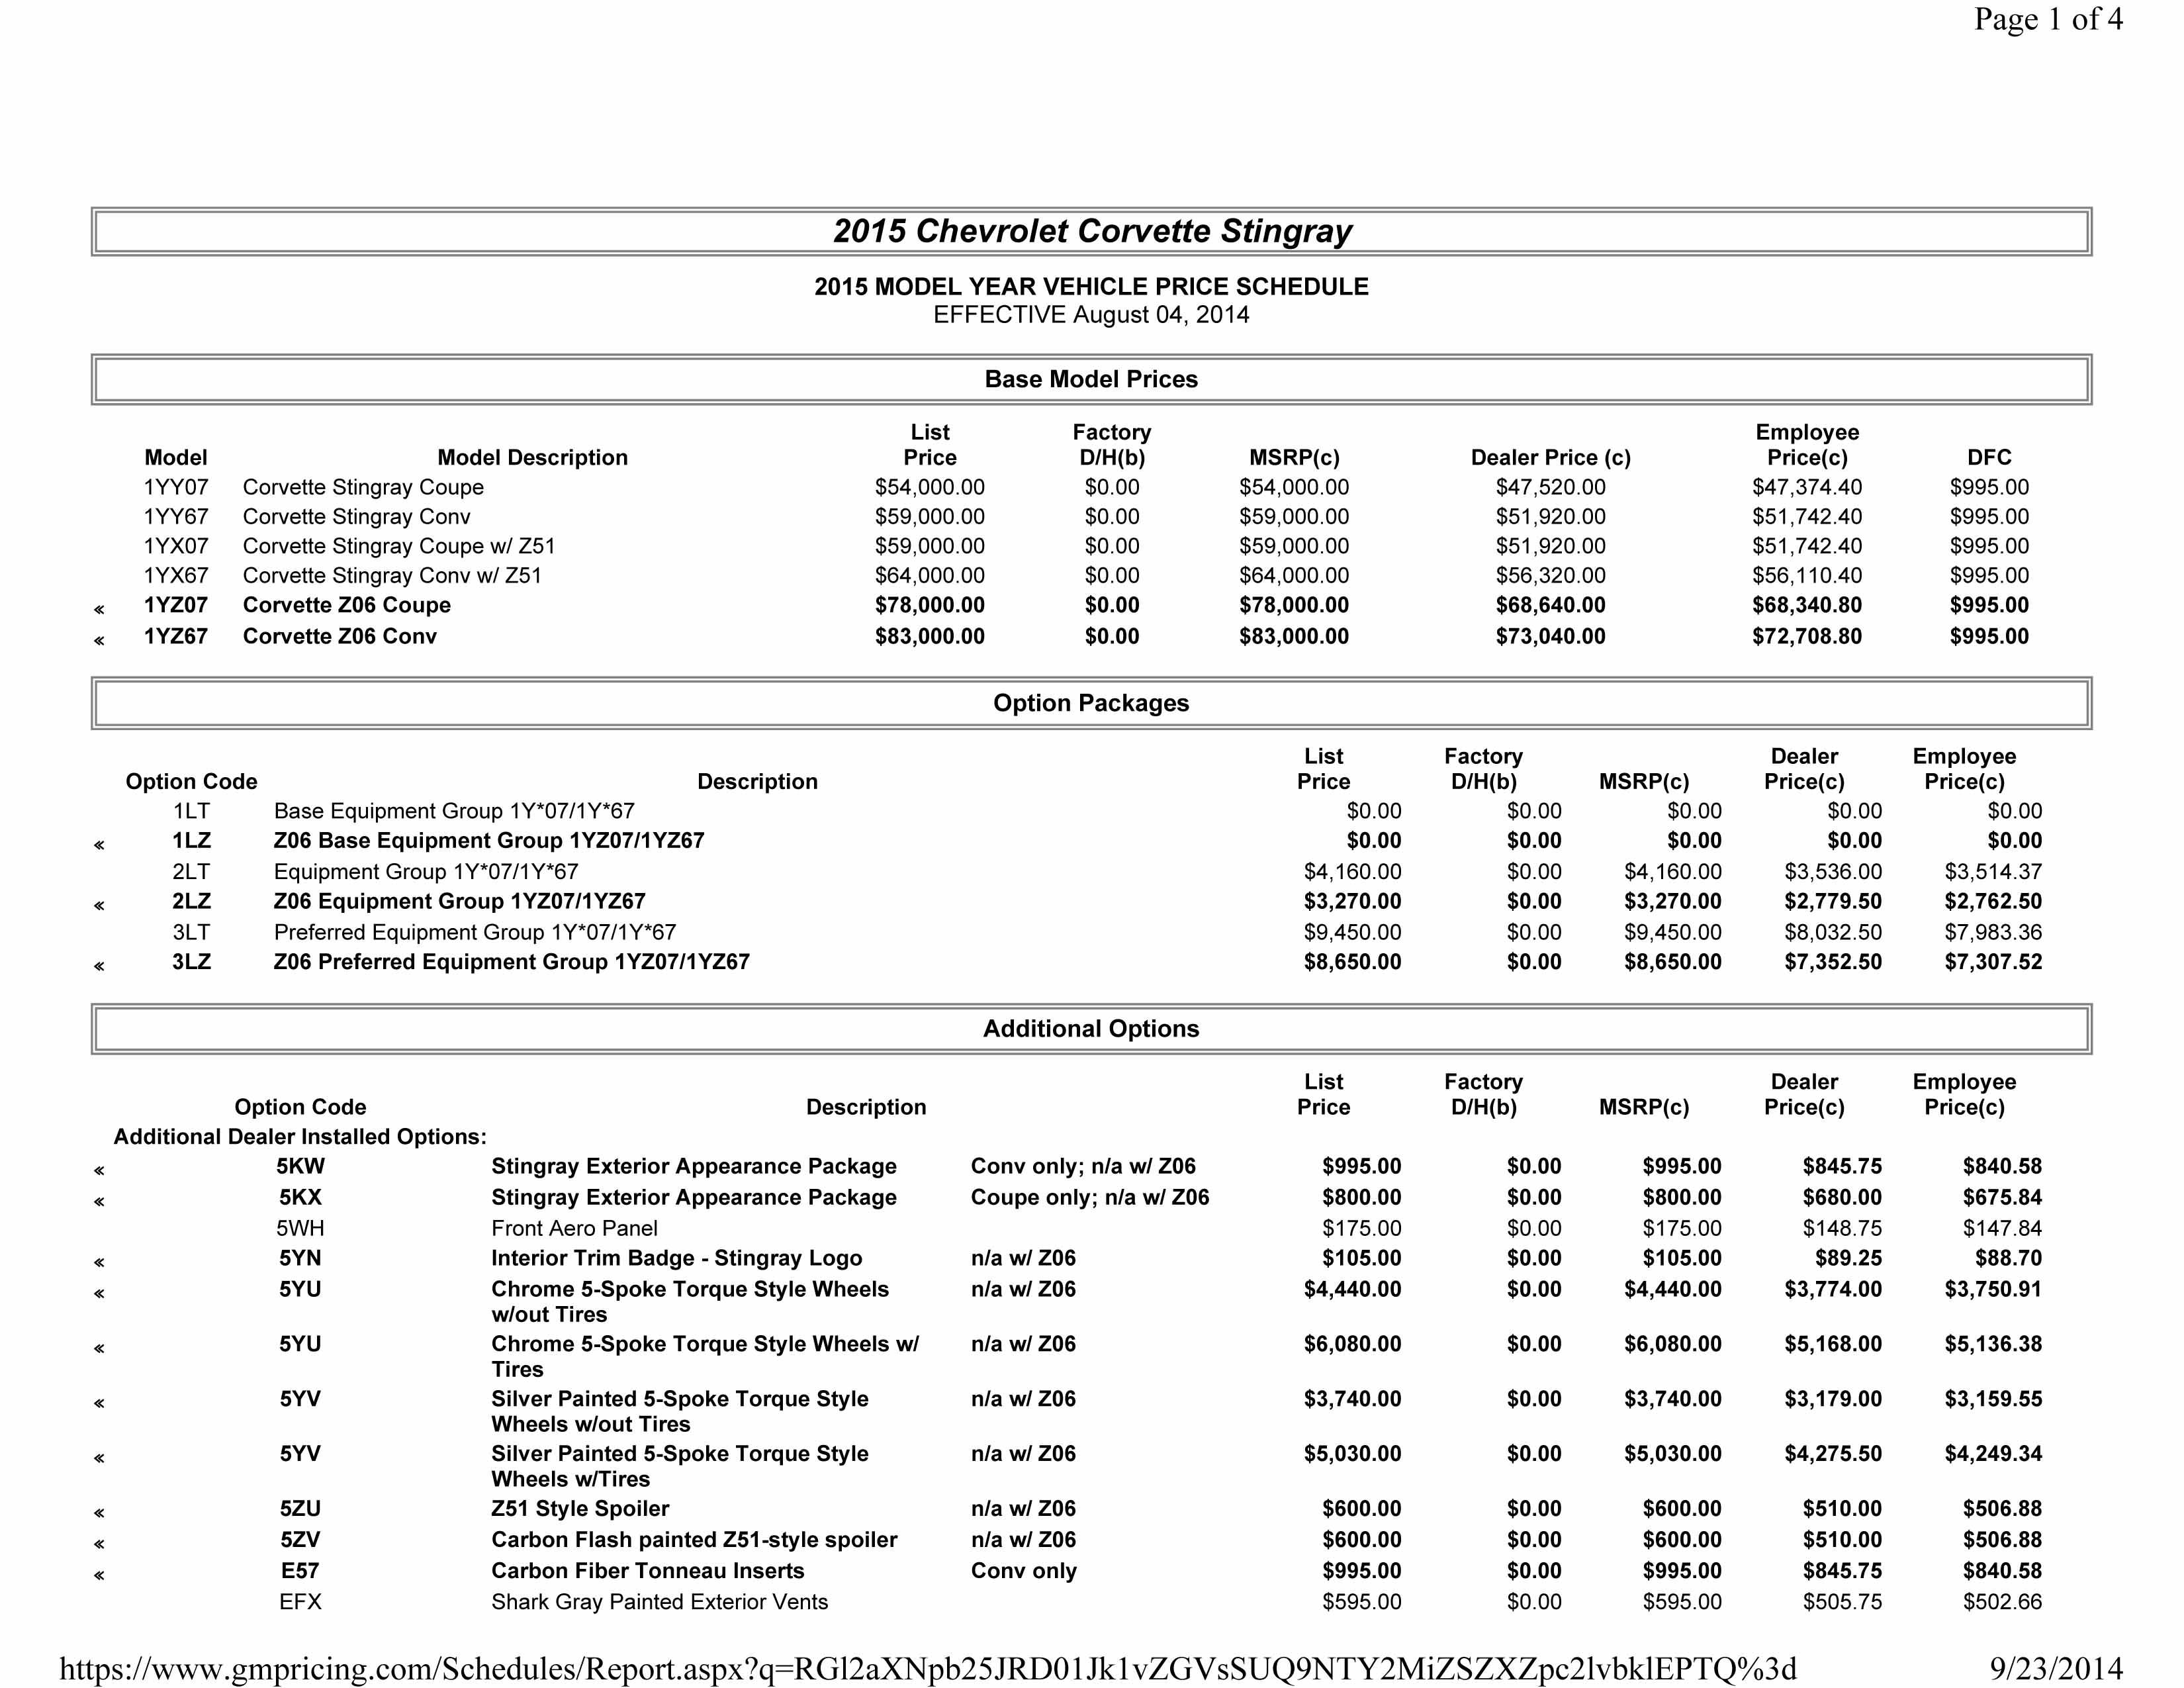 dealer invoice price for 2015 zo6 factory invoice price